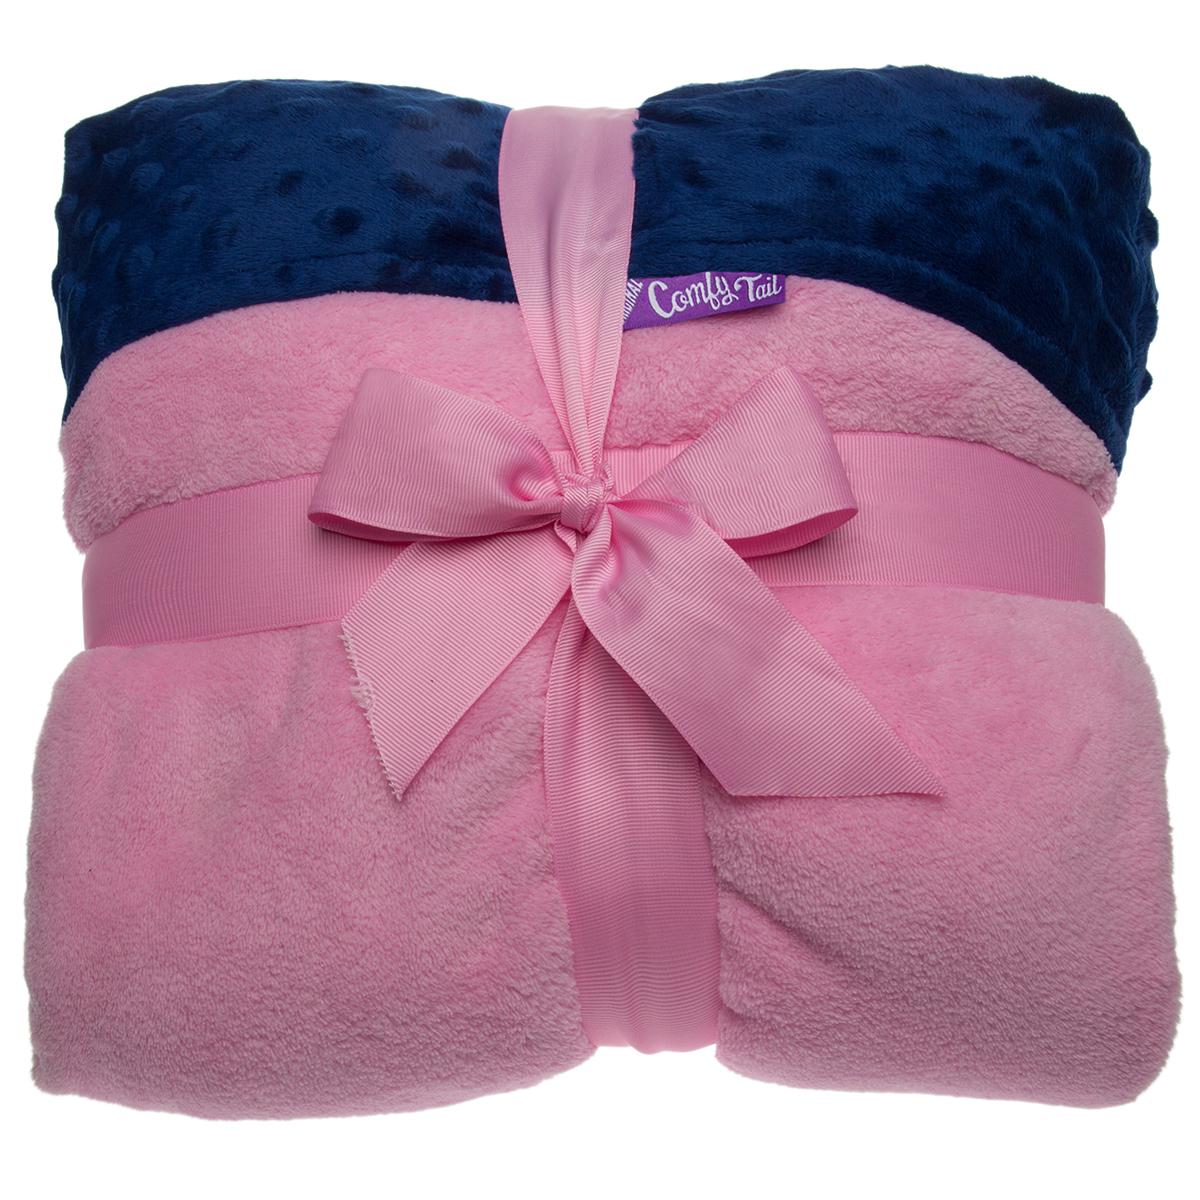 Original Comfy Tail Mermaid Blanket Throw Plush Fleece